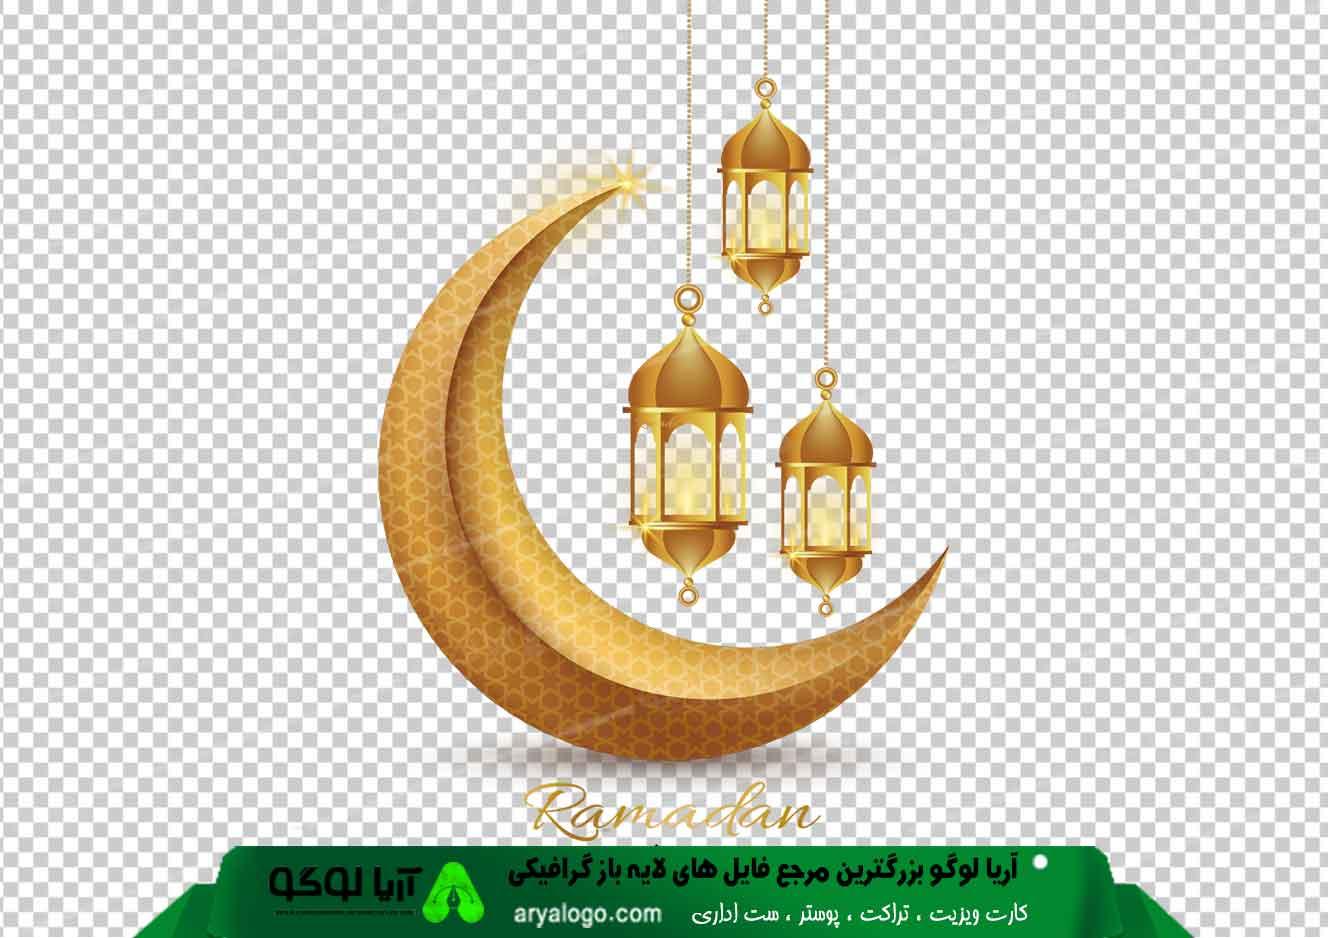 وکتور png ماه رمضان 16